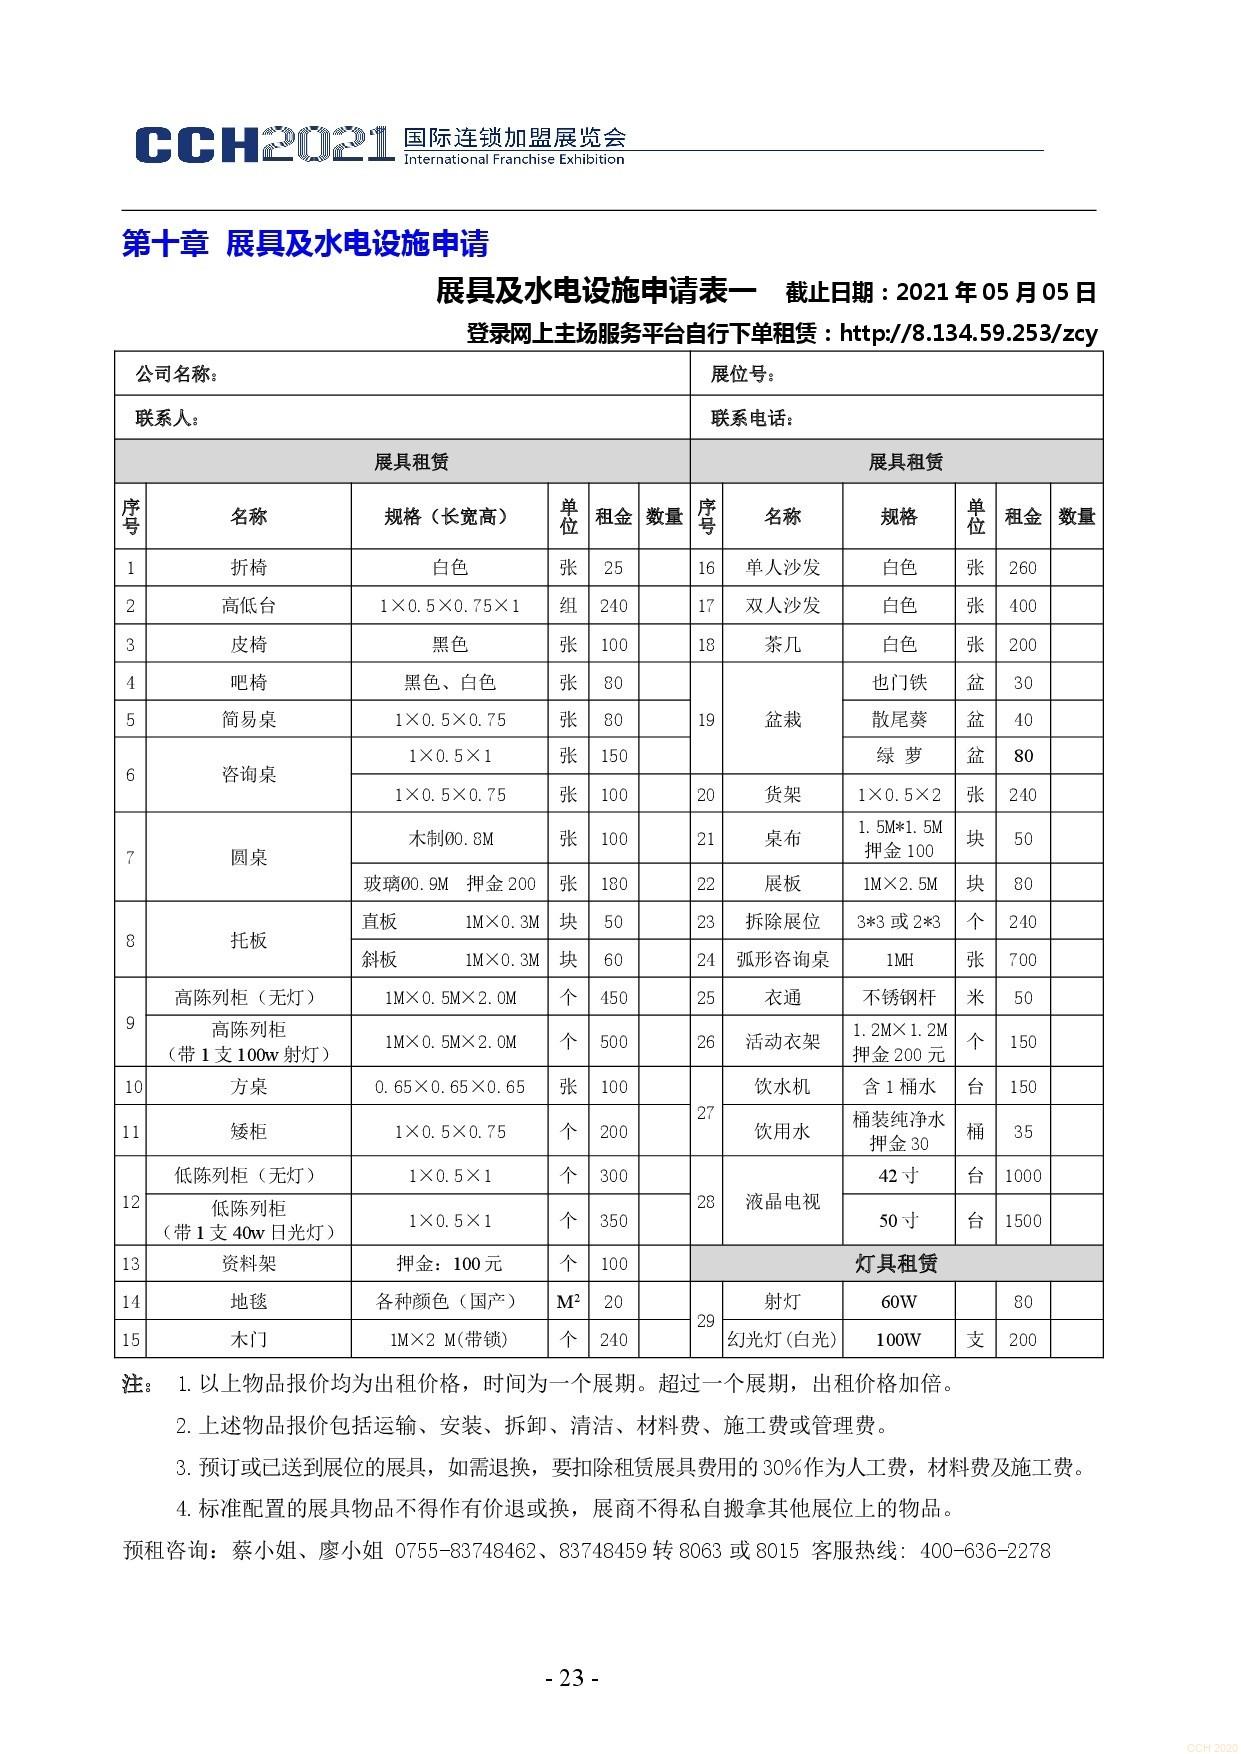 0416CCH深圳展参展商手册4.16-023.jpg